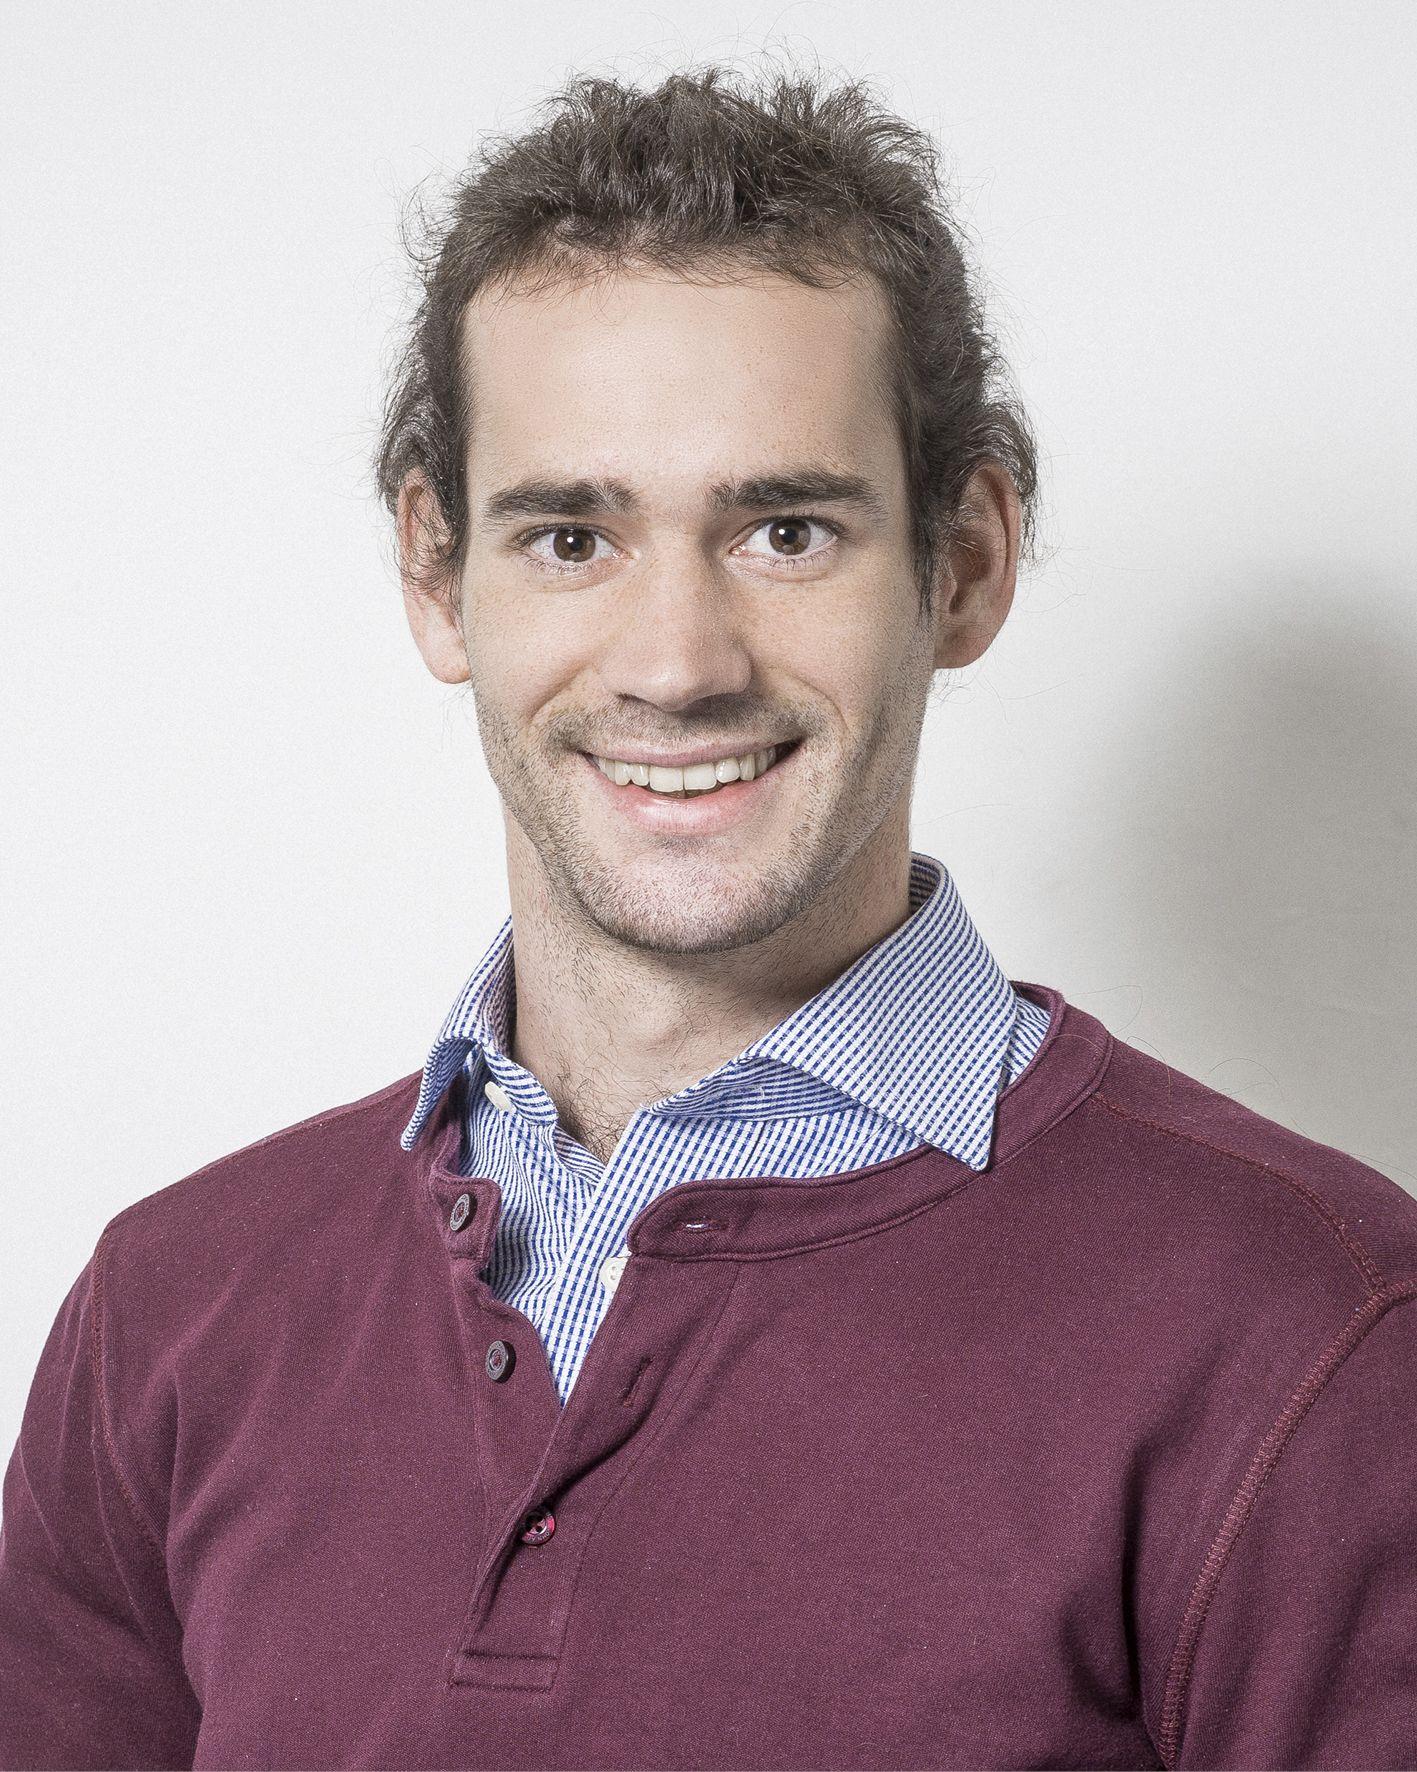 Lukas Schnider